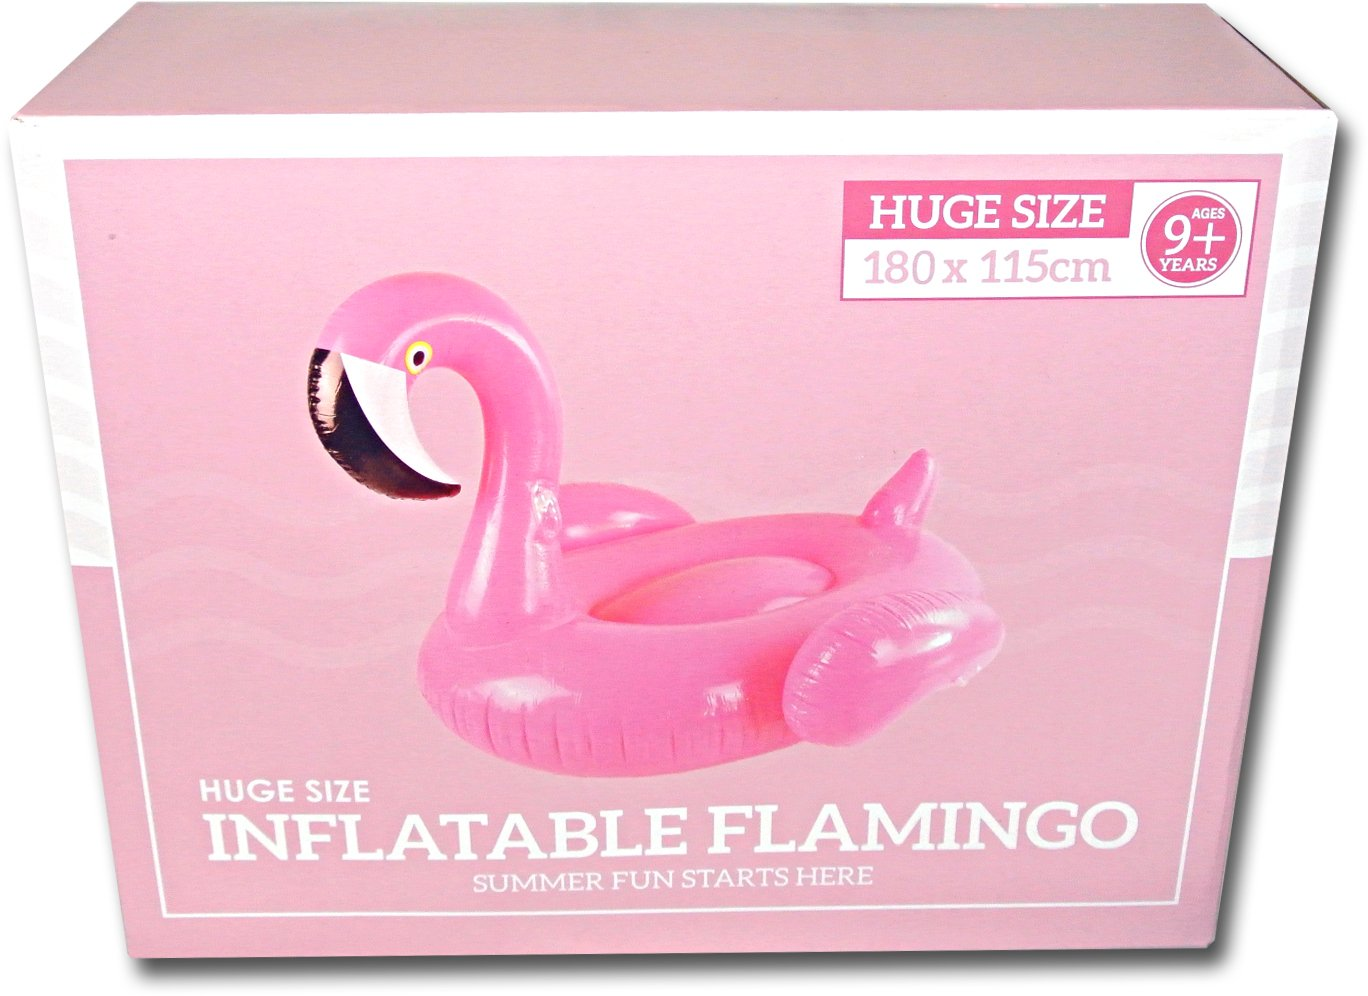 Riesiger aufblasbarer Flamingo Luftmatratzen. Aufblasbarer Flamingo Pool Floß Durch Integrity Co (X-Large)